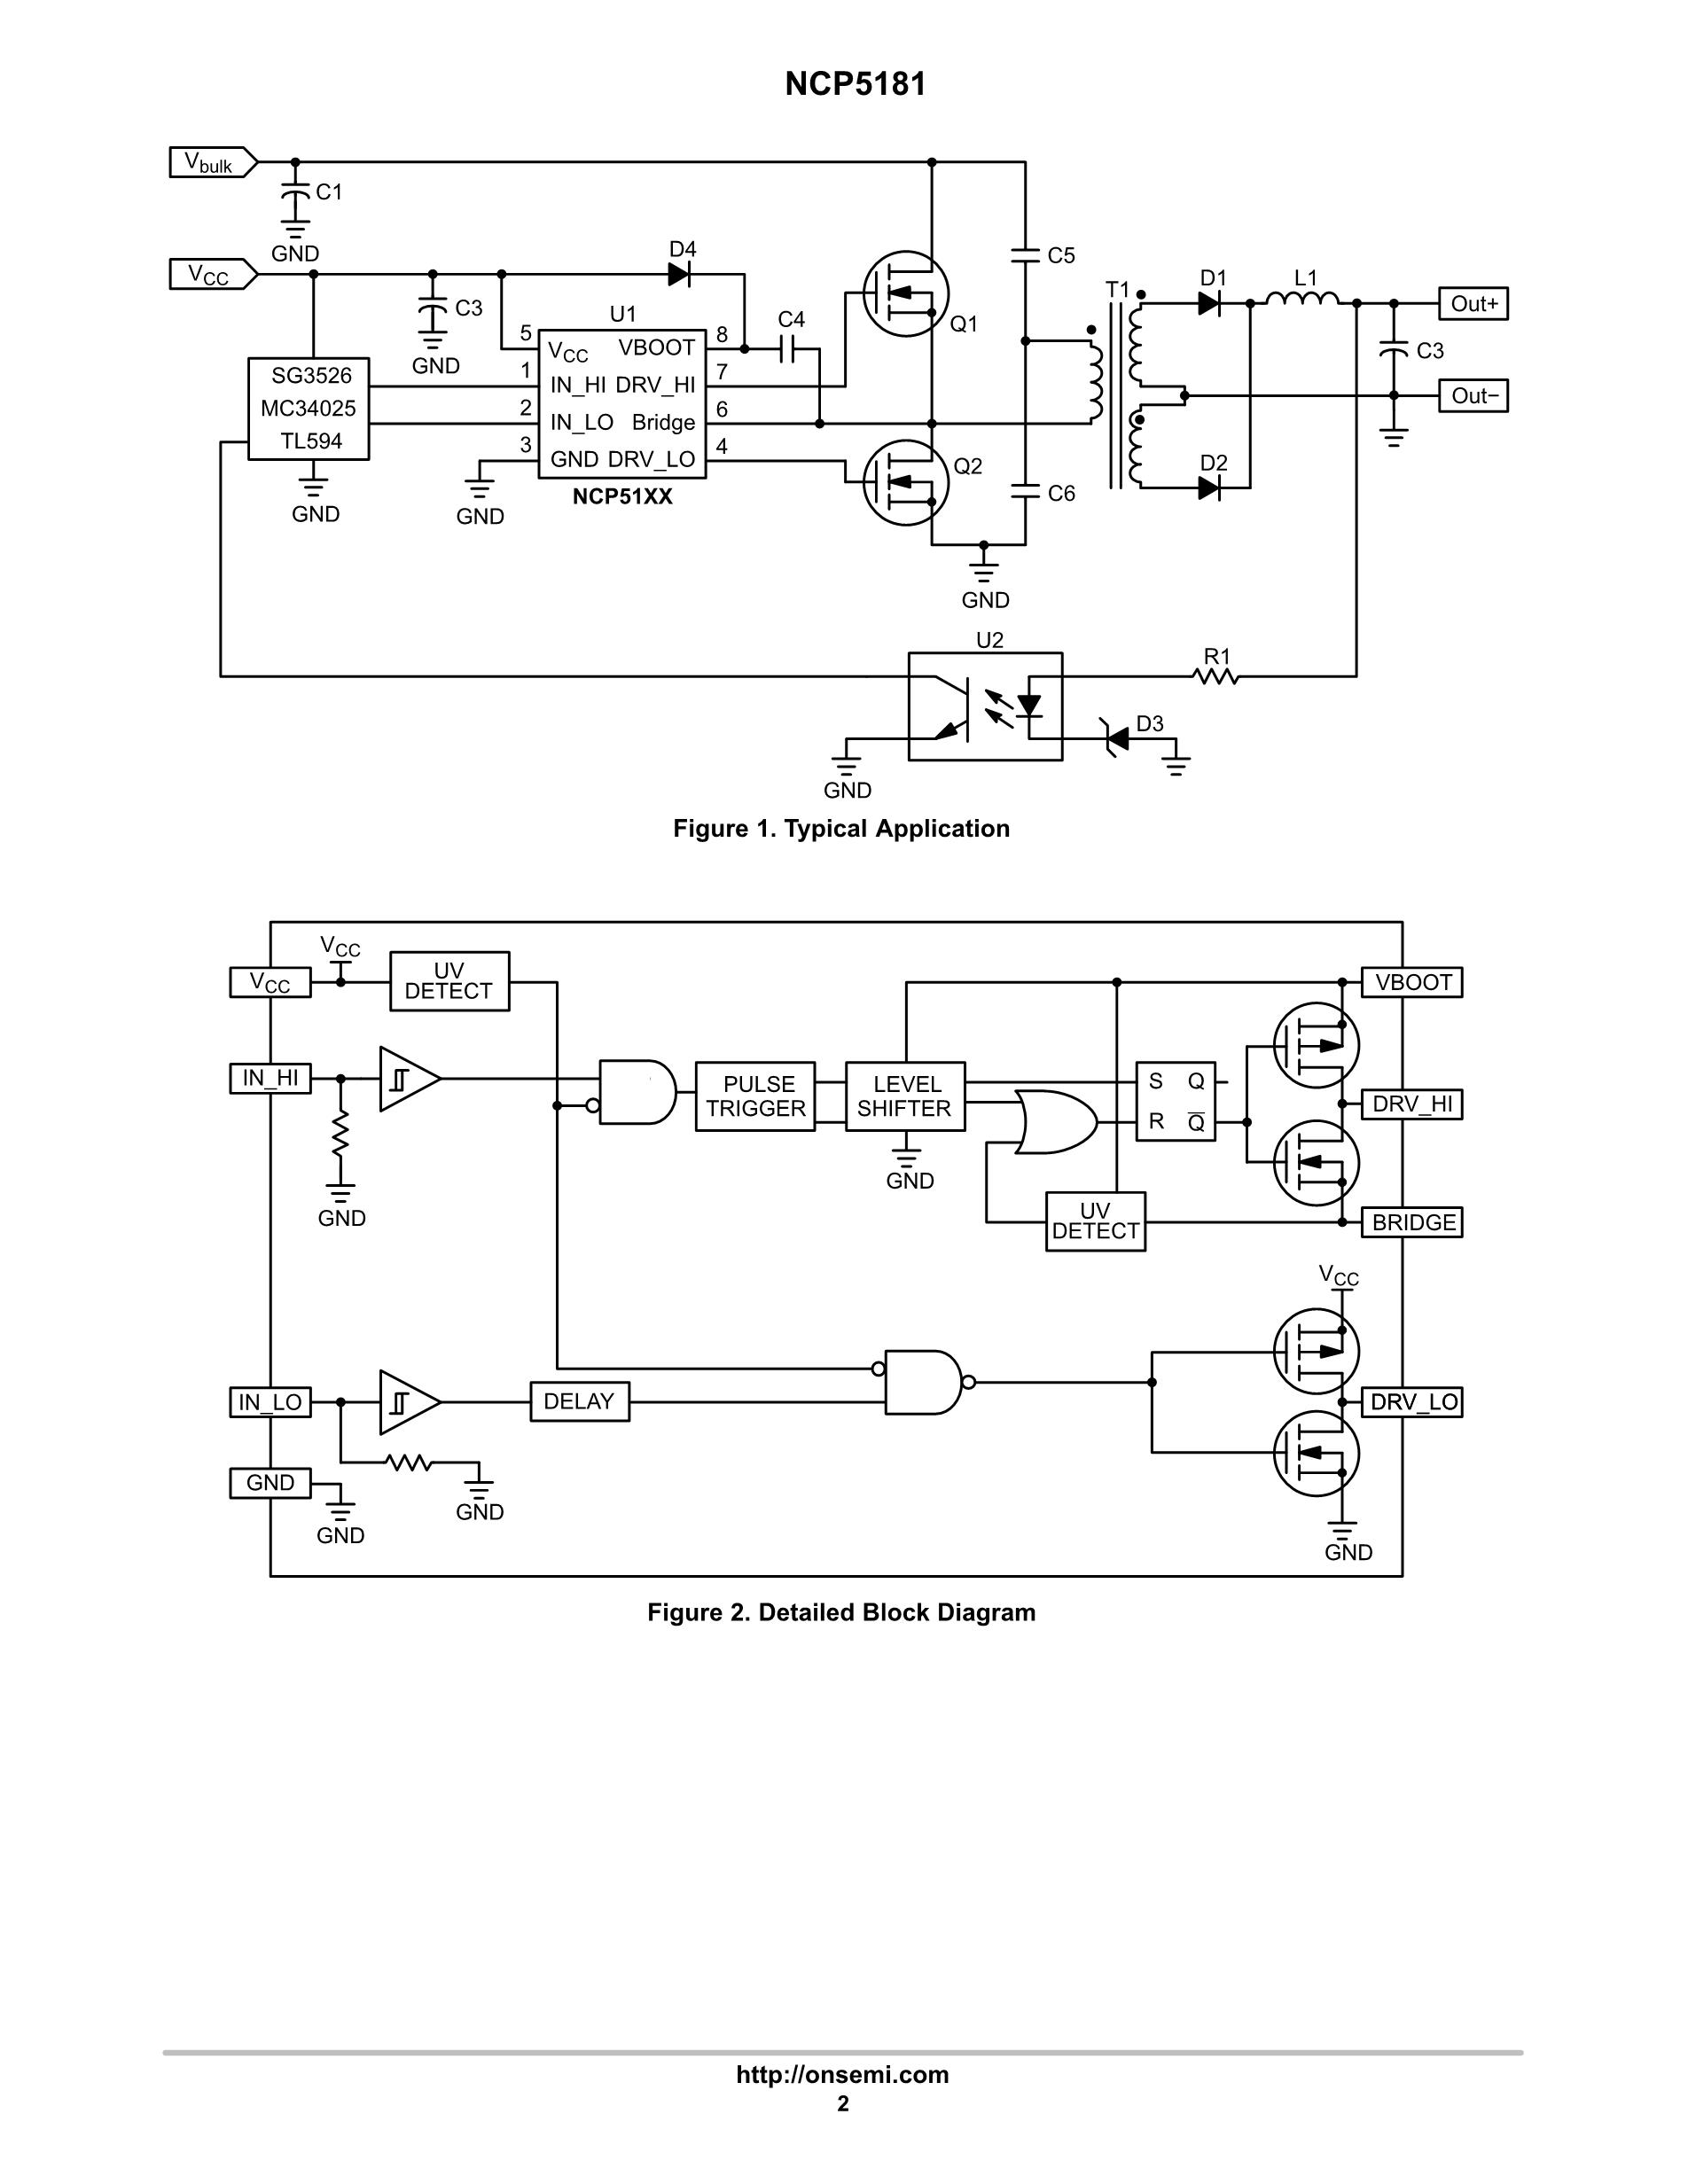 NCP5021MUTXG's pdf picture 2